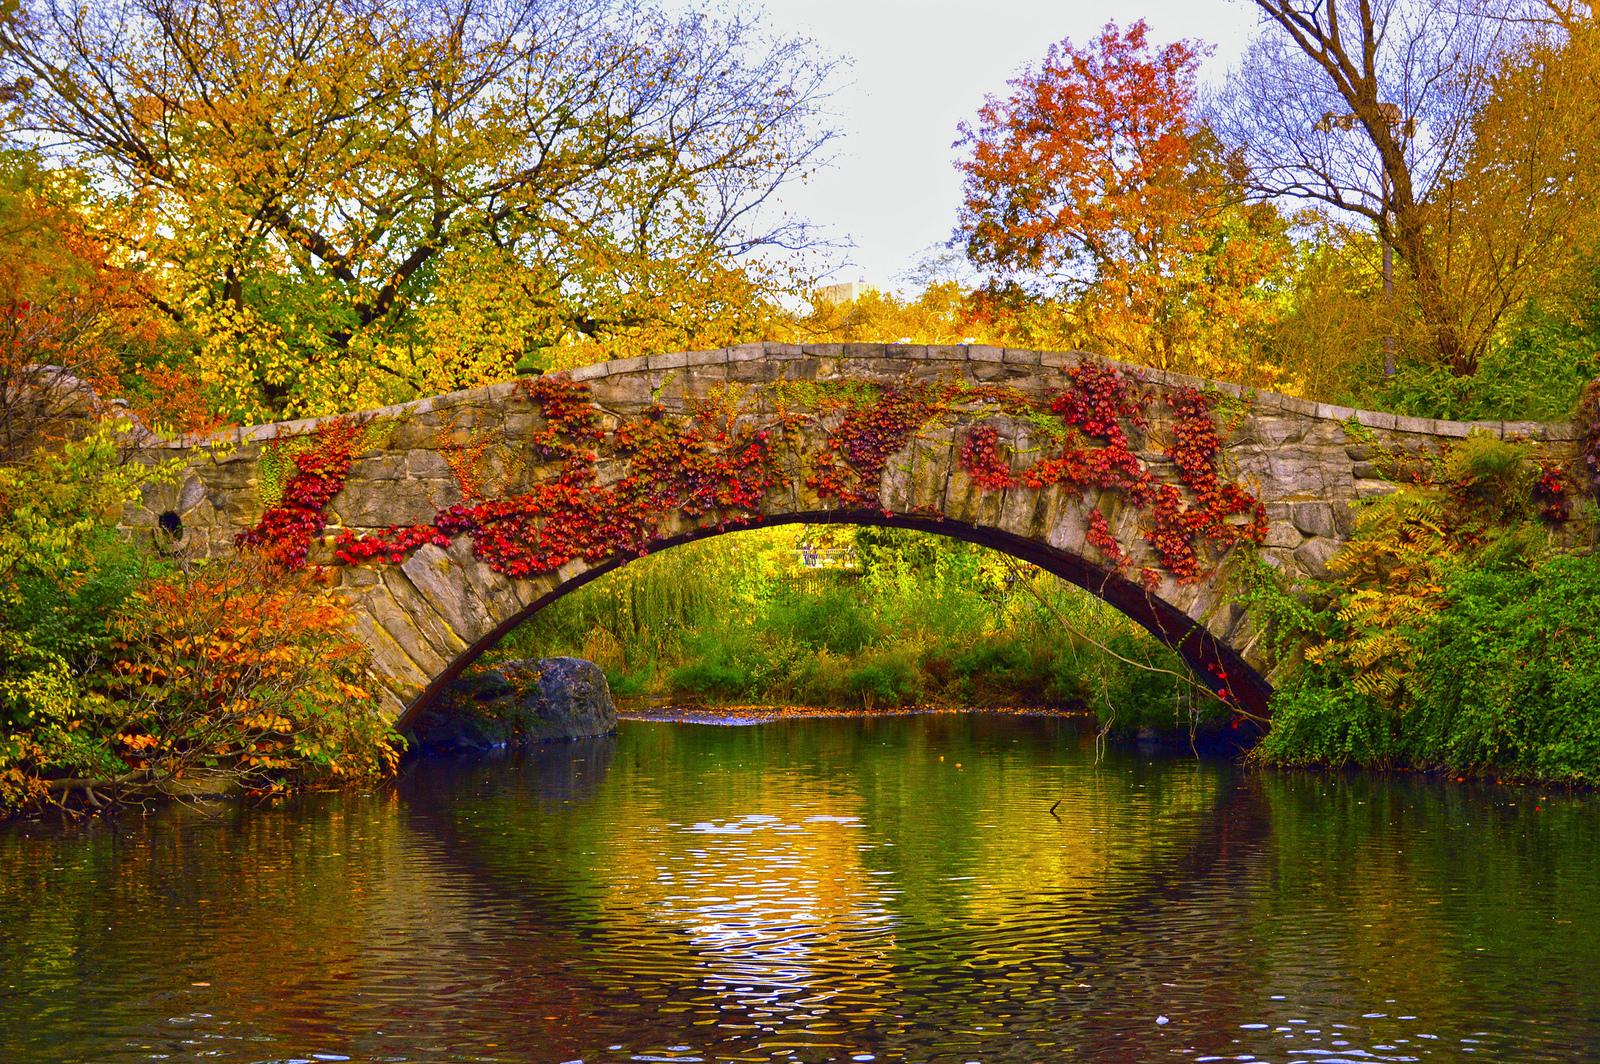 Central Park New York Bridge With Flowers Frederico Domondon